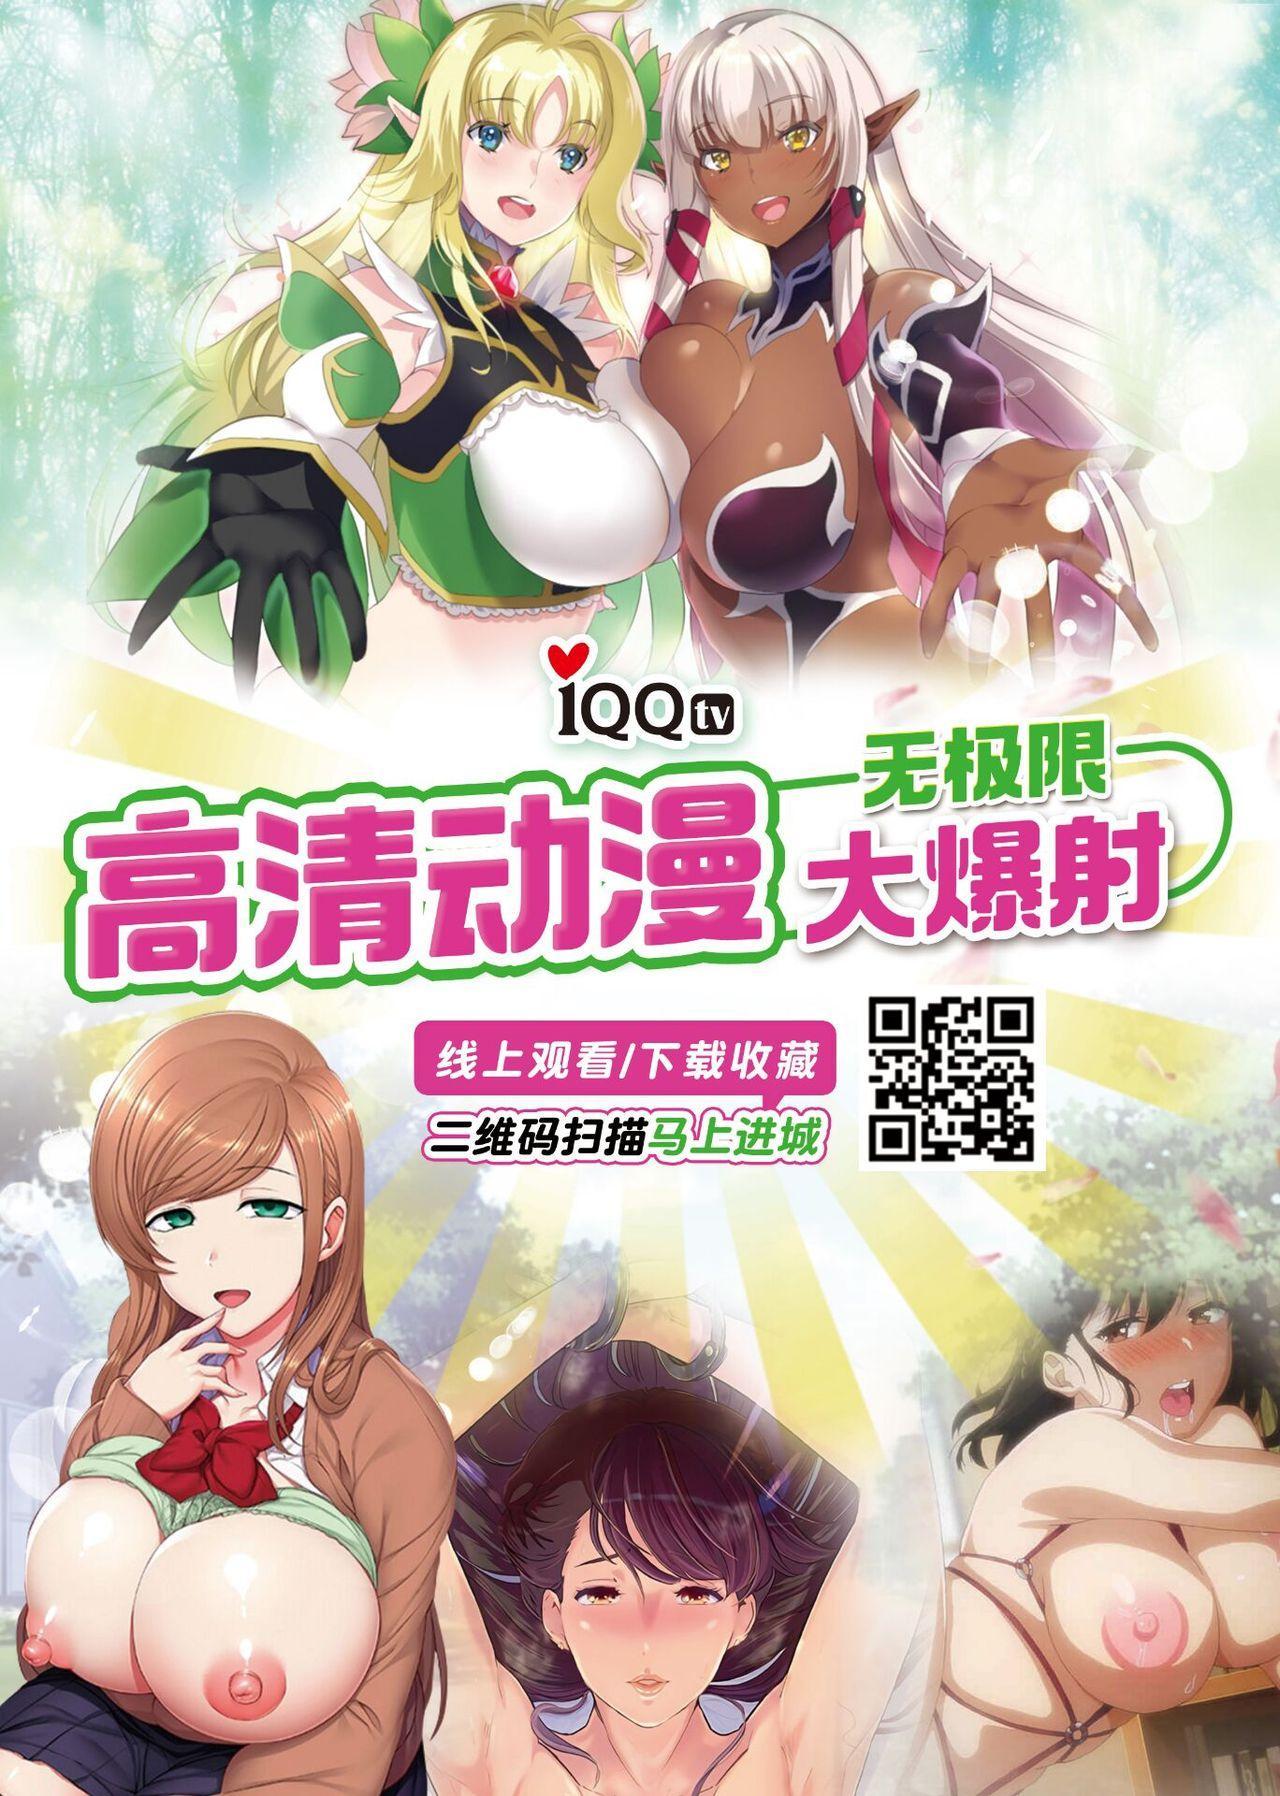 1000 Yen Cut no Onee-san ni Suite Morau Hon. II 24